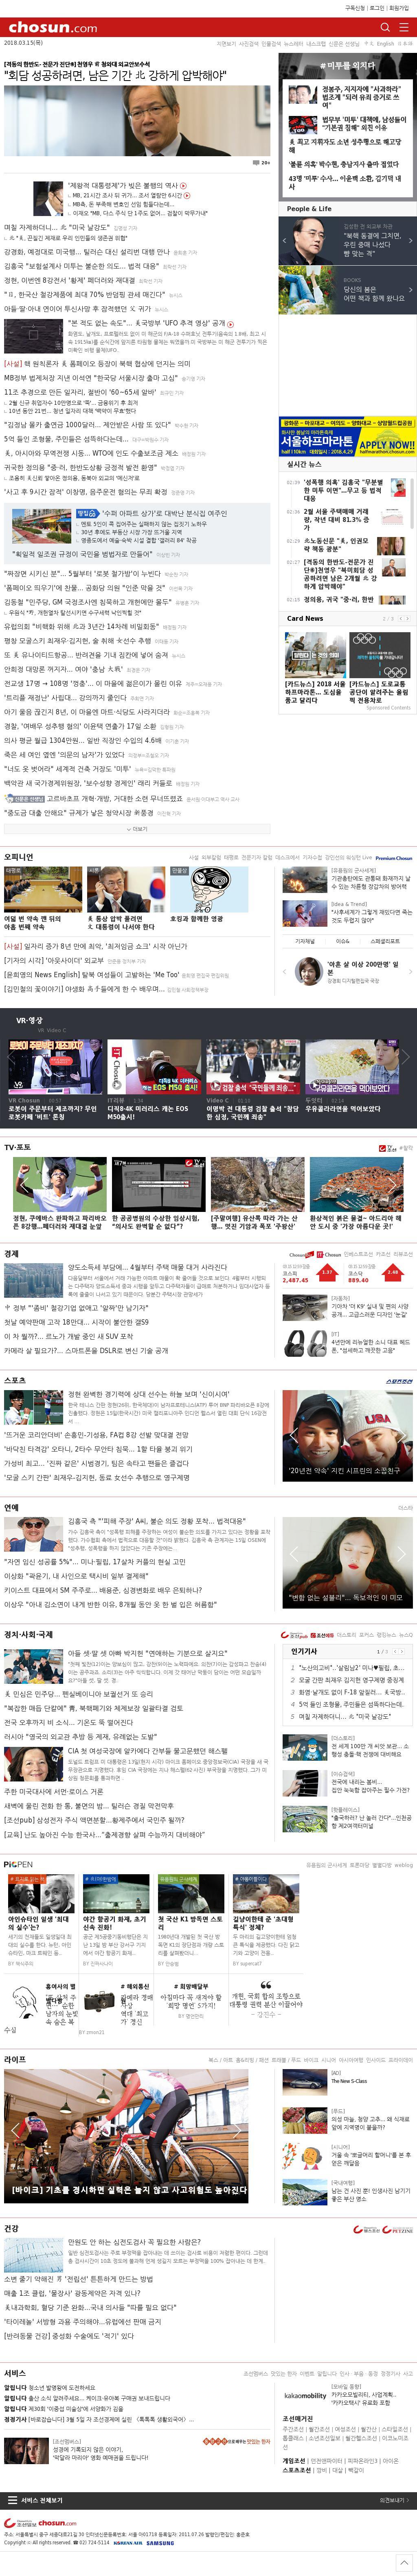 chosun.com at Thursday March 15, 2018, 4 a.m. UTC